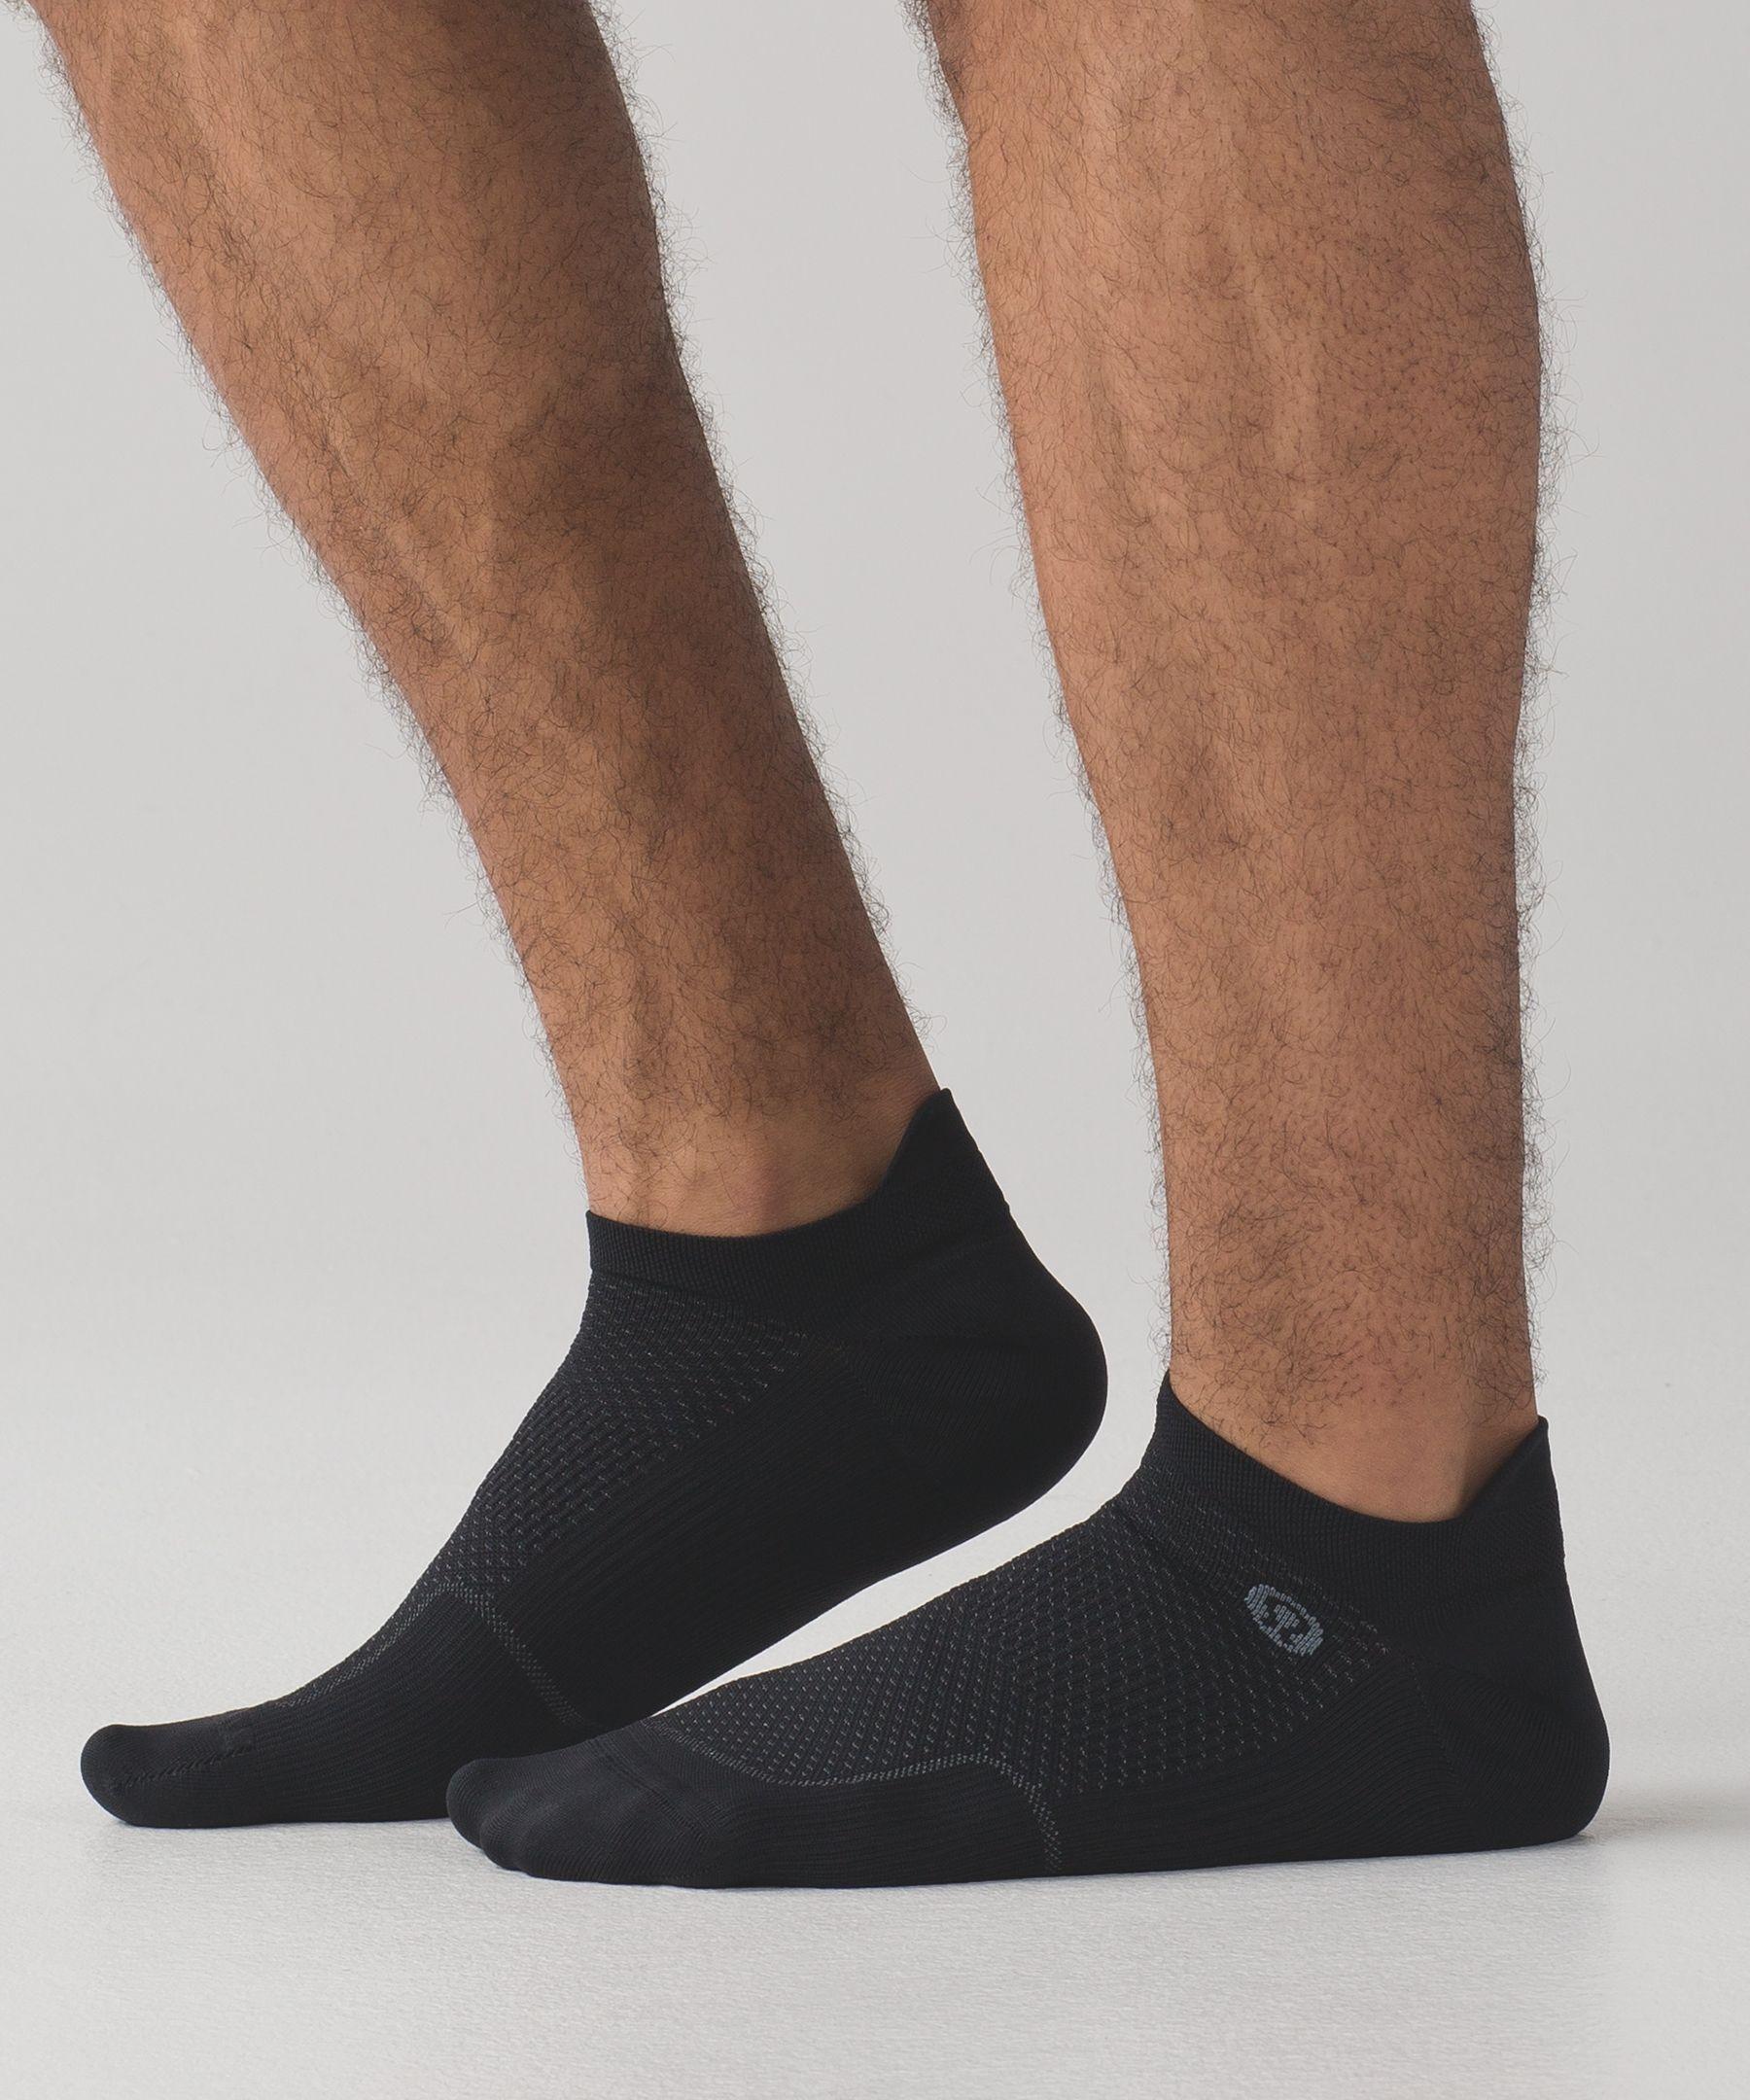 cd37139b5 lululemon Men's Surge Sock Silver, | Products | Socks, Running socks ...